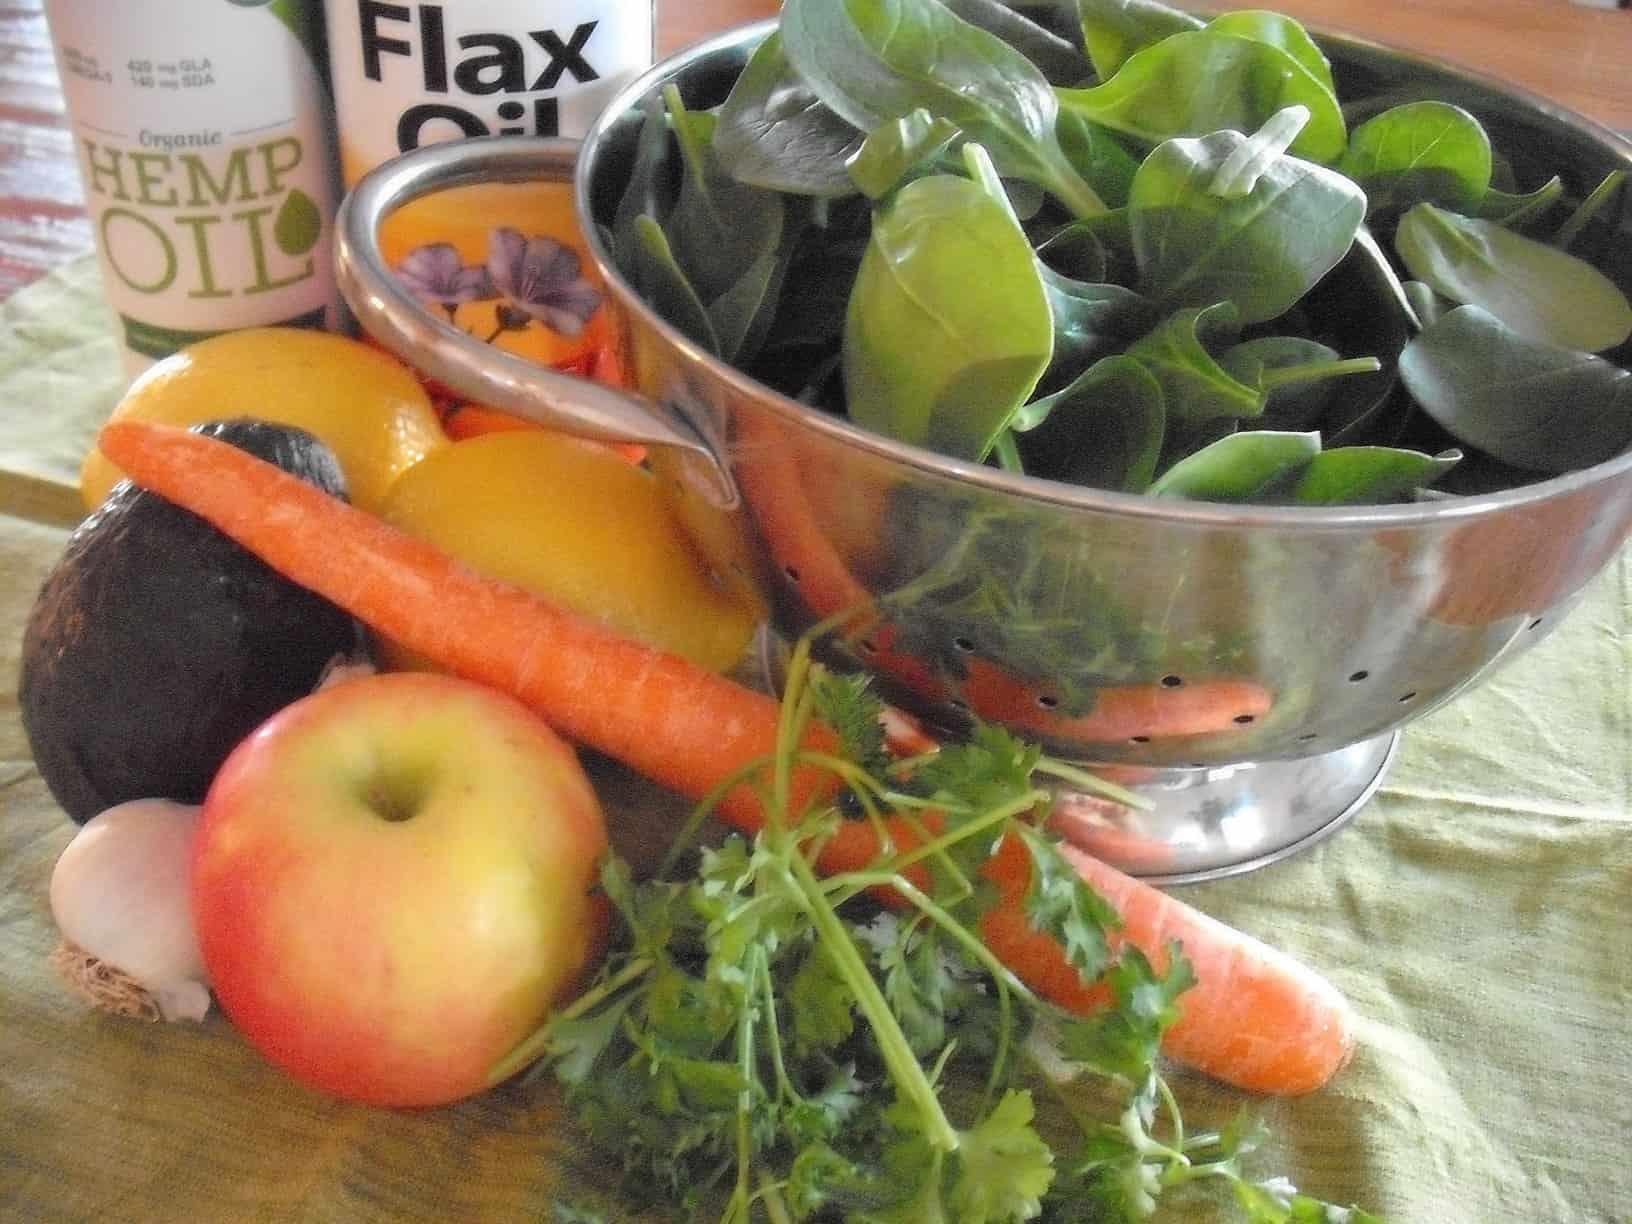 Coming Clean with Great Food: Lemon Vinaigrette Detox Salad